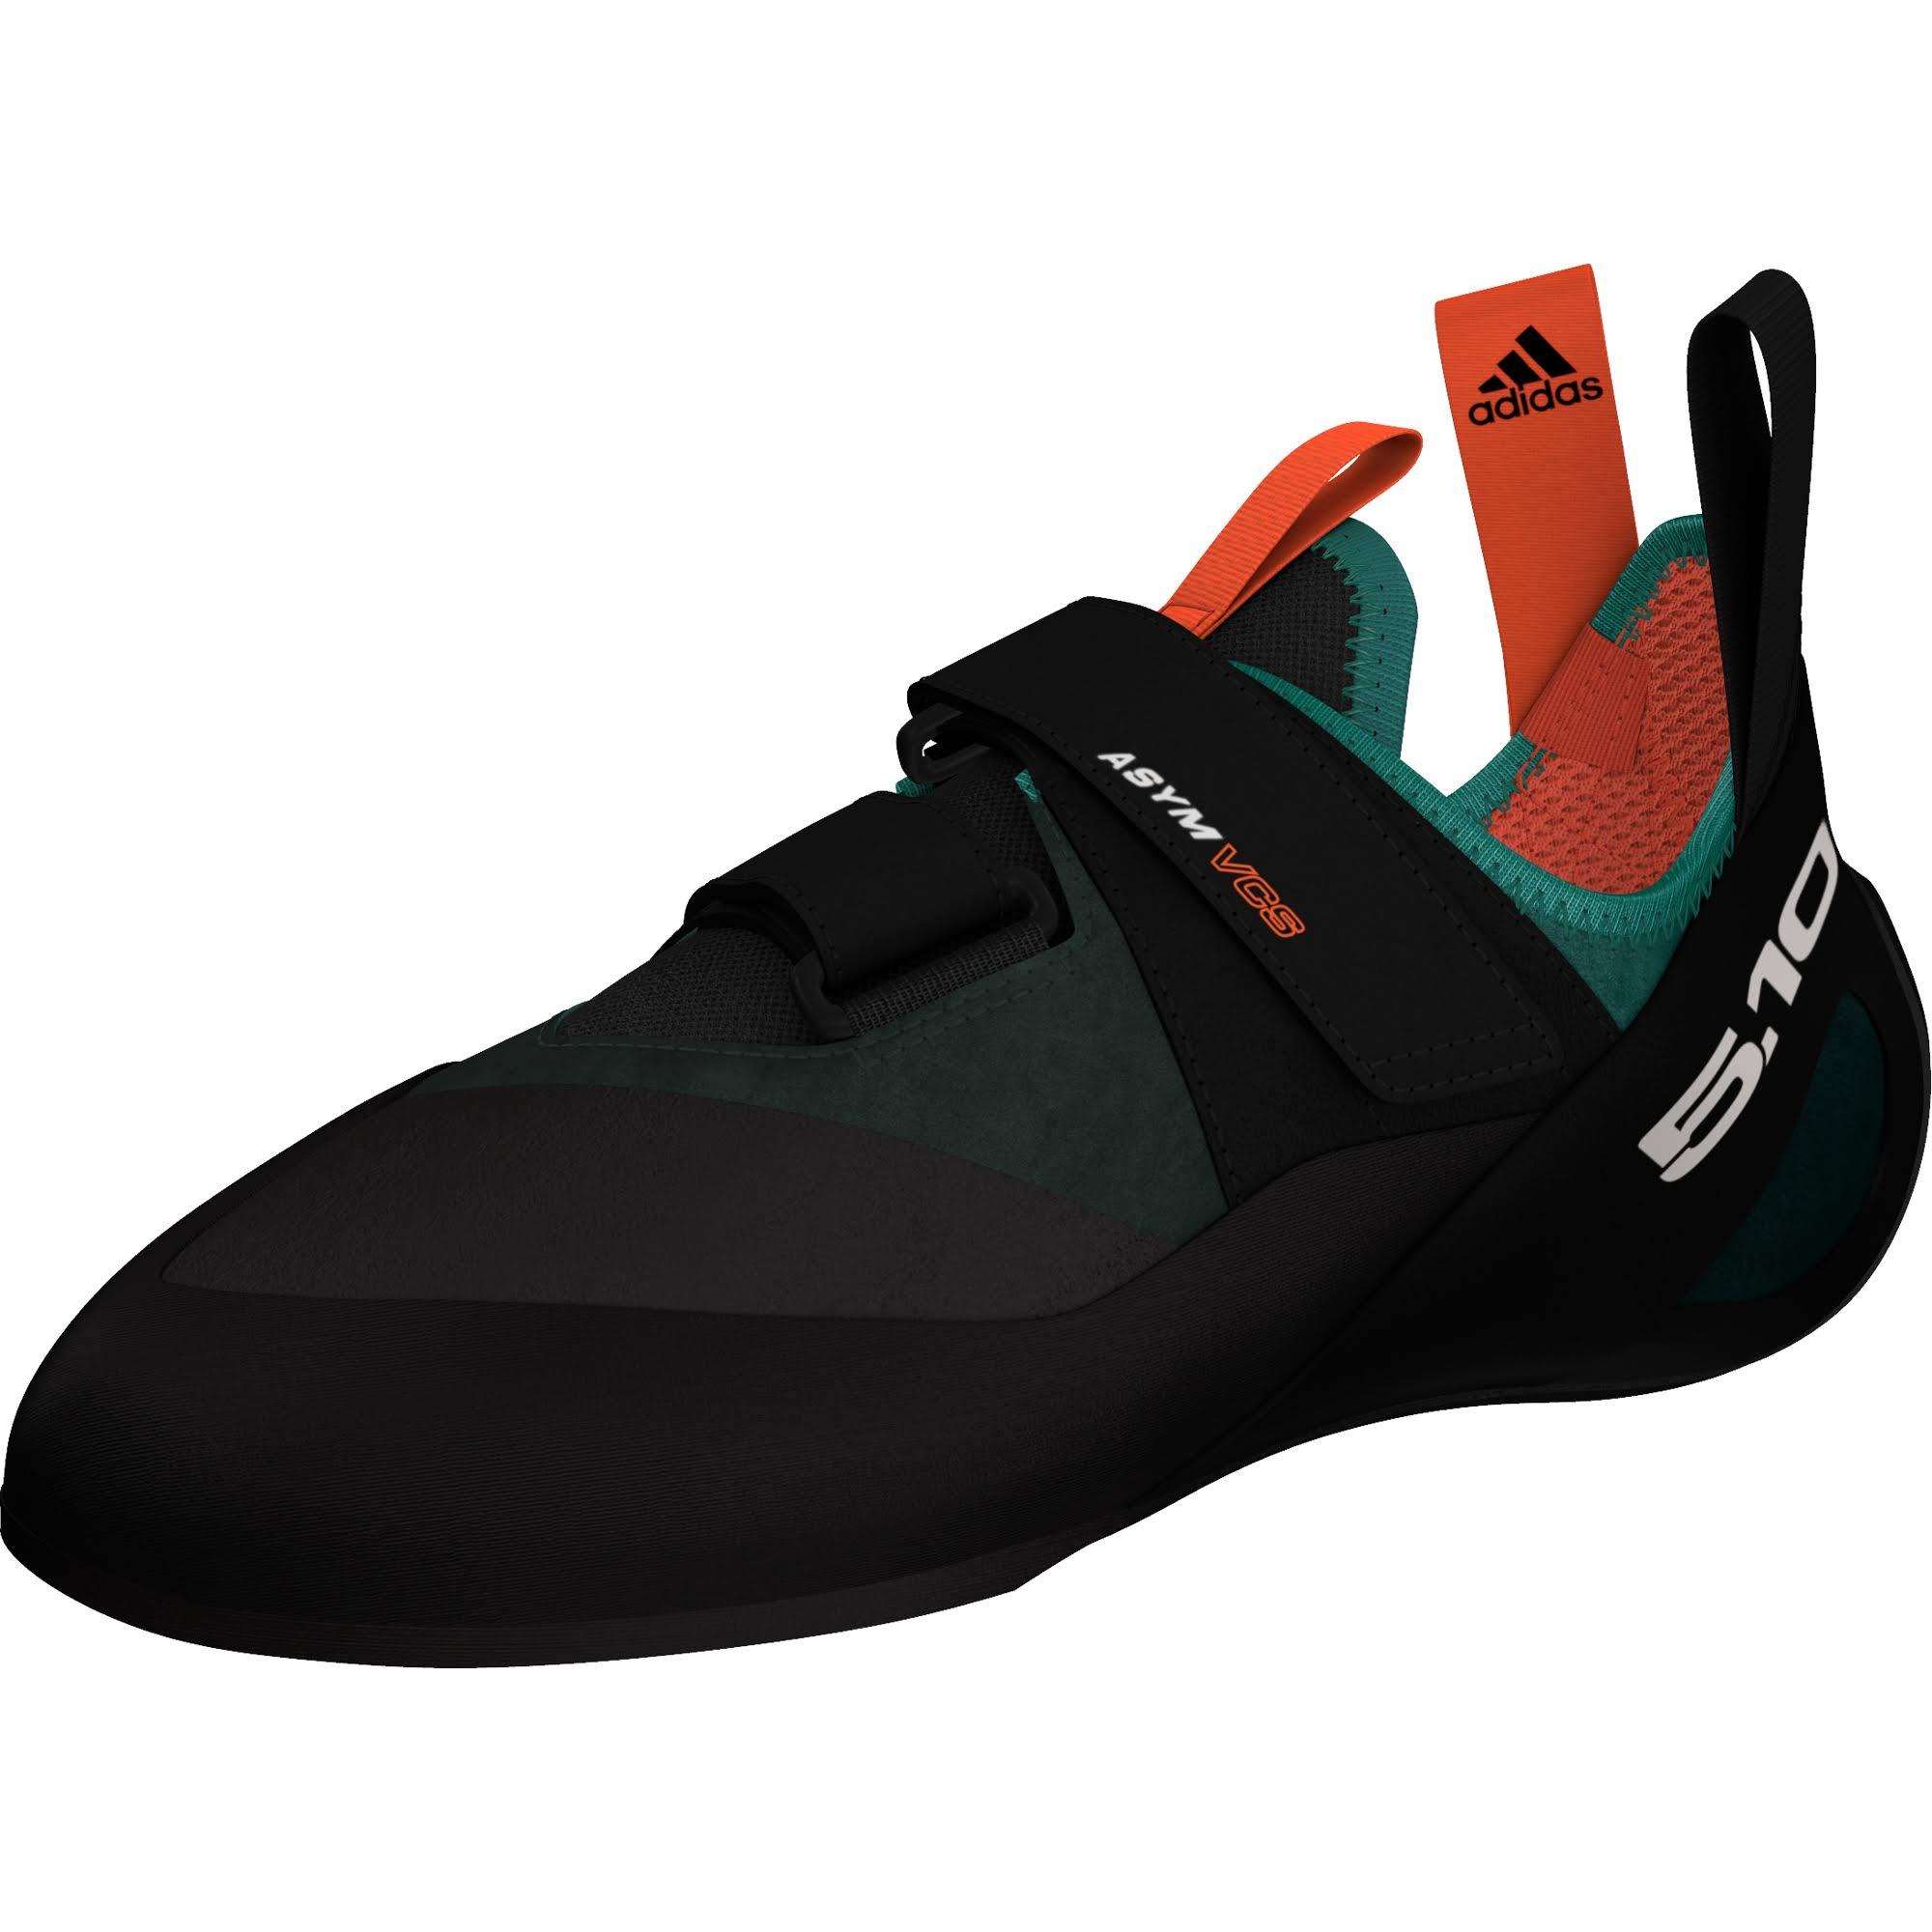 Five Ten Asym VCS Climbing Shoes (12, Black)